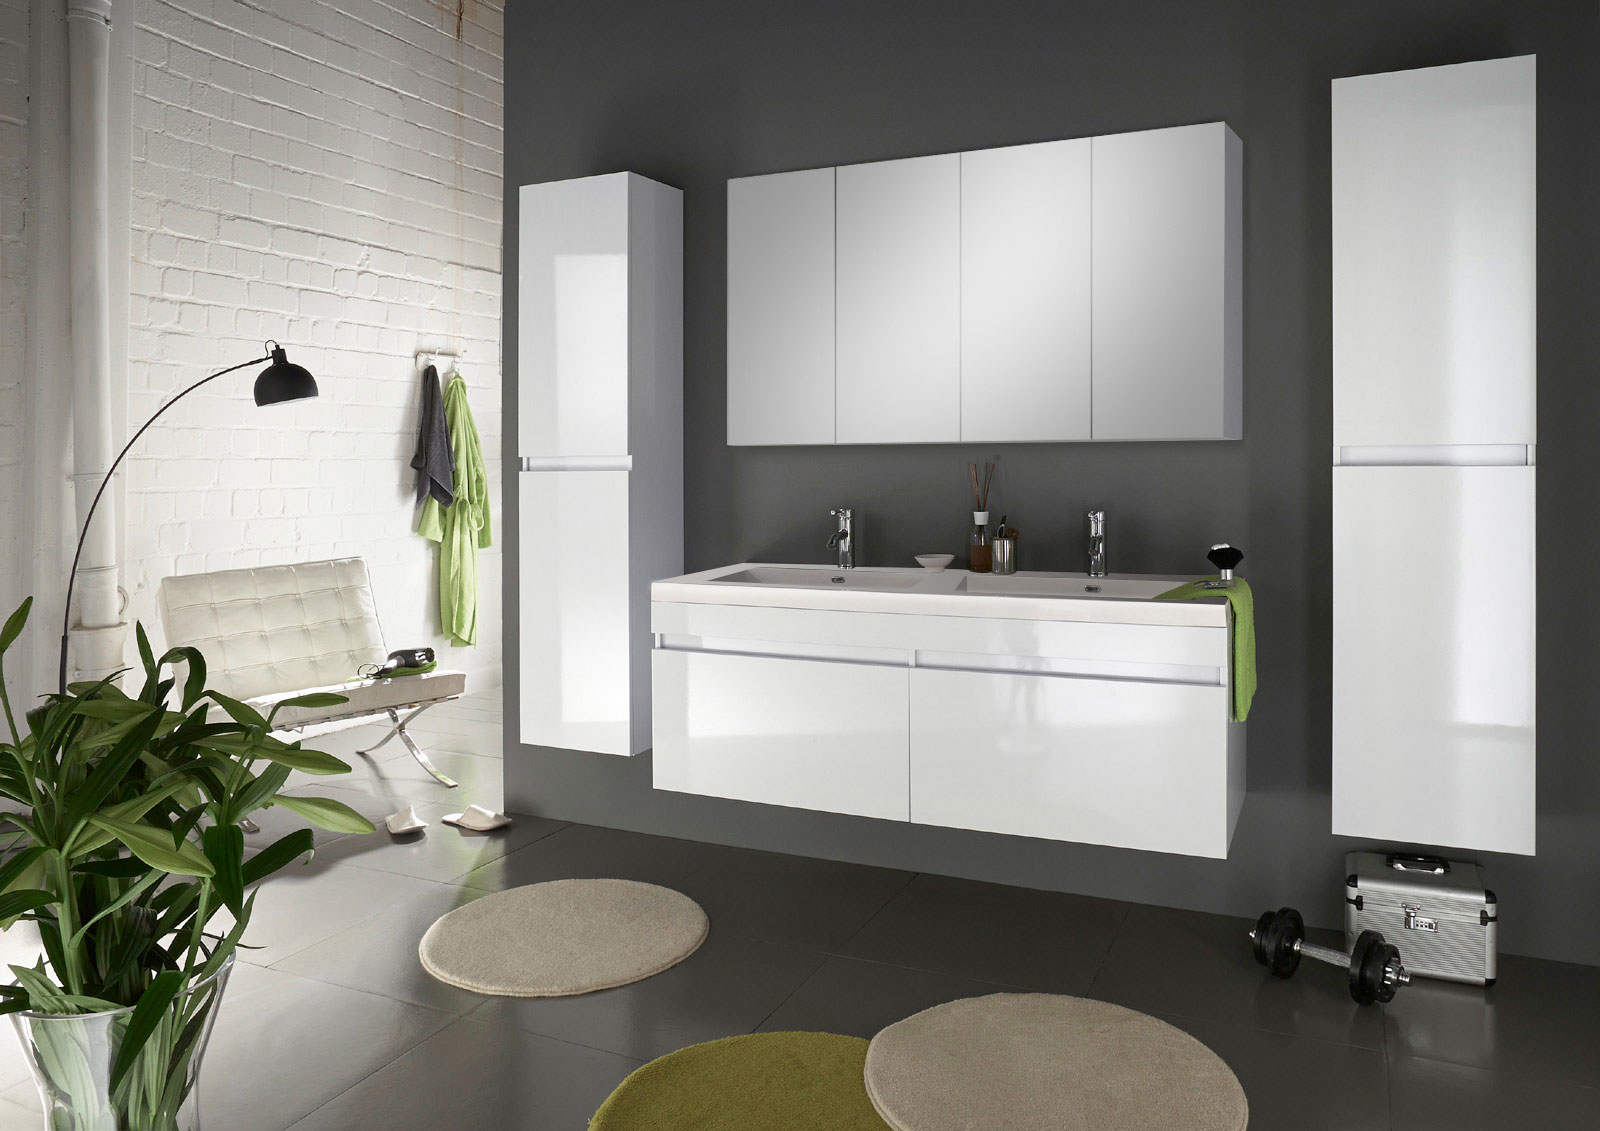 sam badm bel 4tlg set wei hochglanz 140 cm parma deluxe auf lager. Black Bedroom Furniture Sets. Home Design Ideas